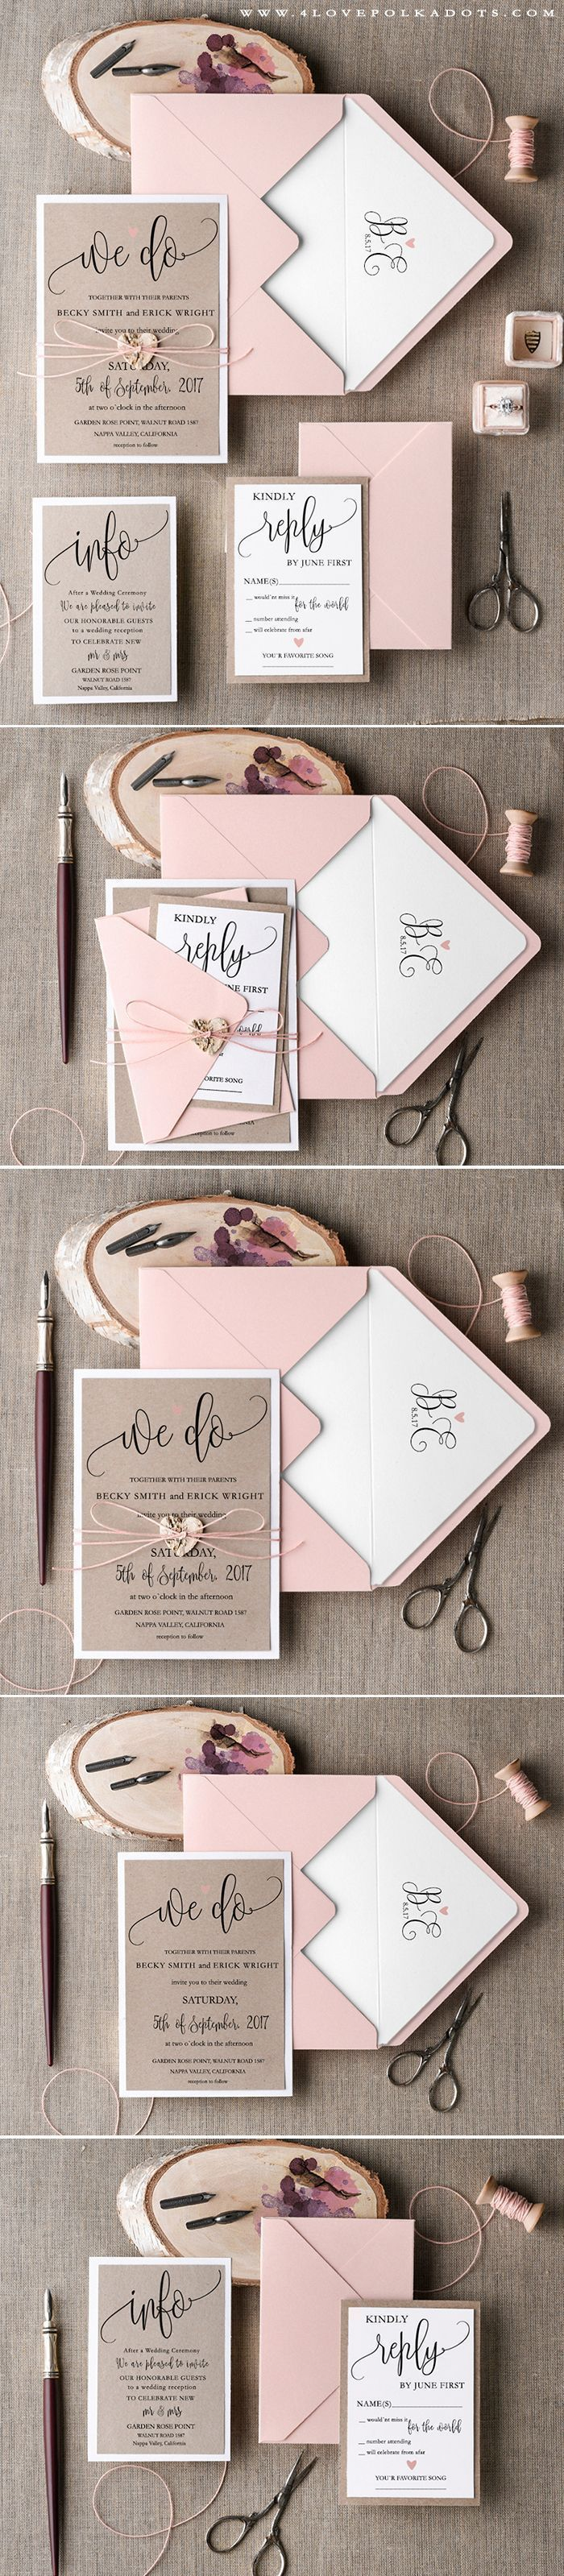 Pink & Eco Handmade Wedding Invitation #summerwedding #weddinginvitations